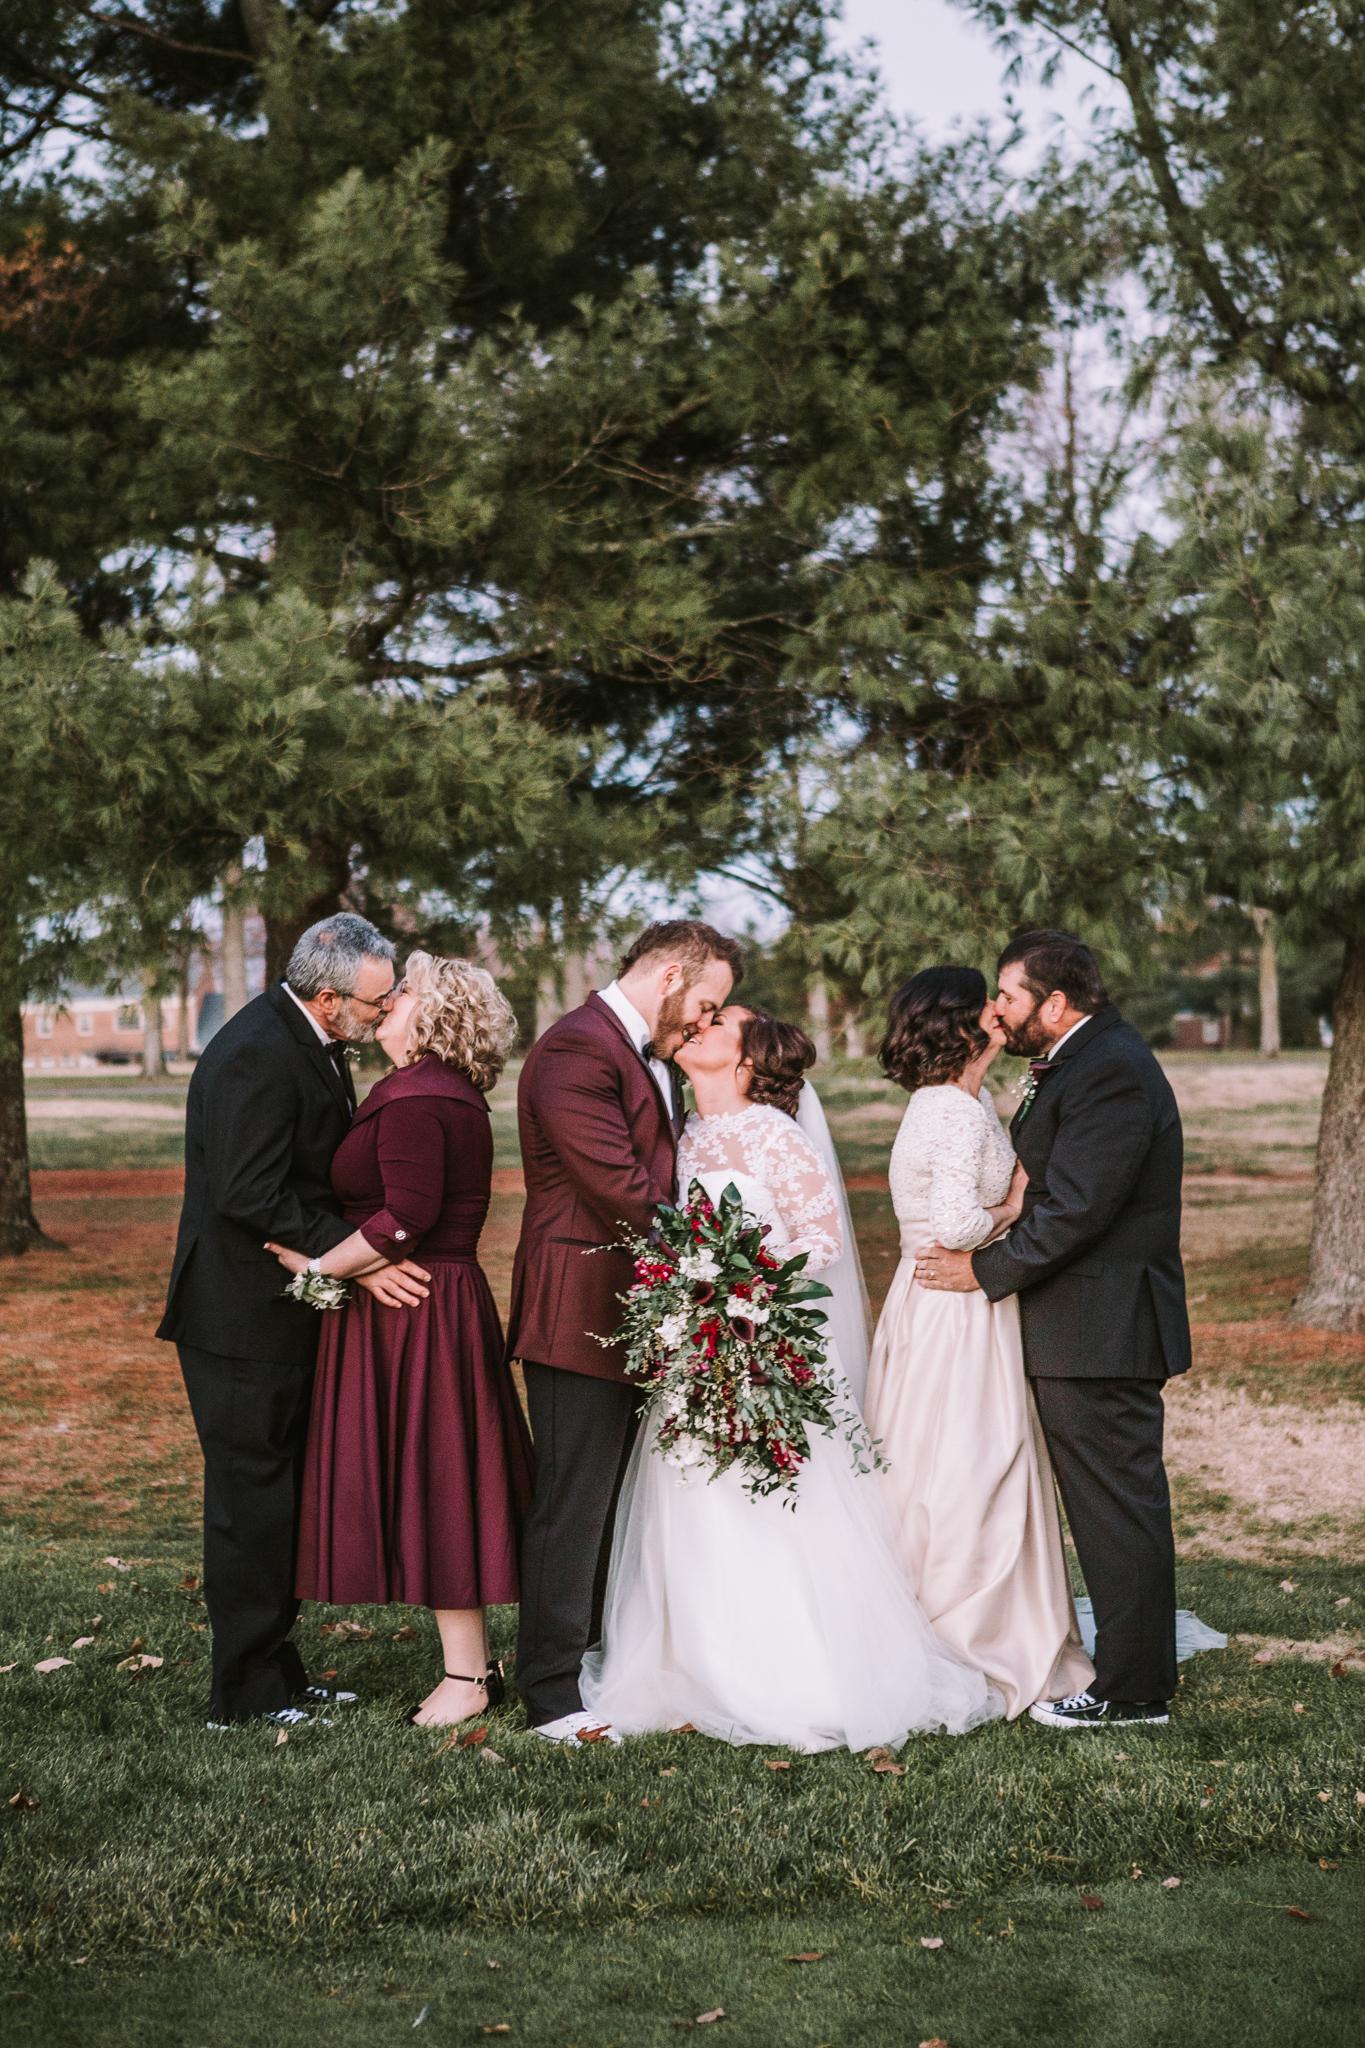 Richmond Kentucky Wedding Photographer - Ariana Jordan Photography -28.jpg